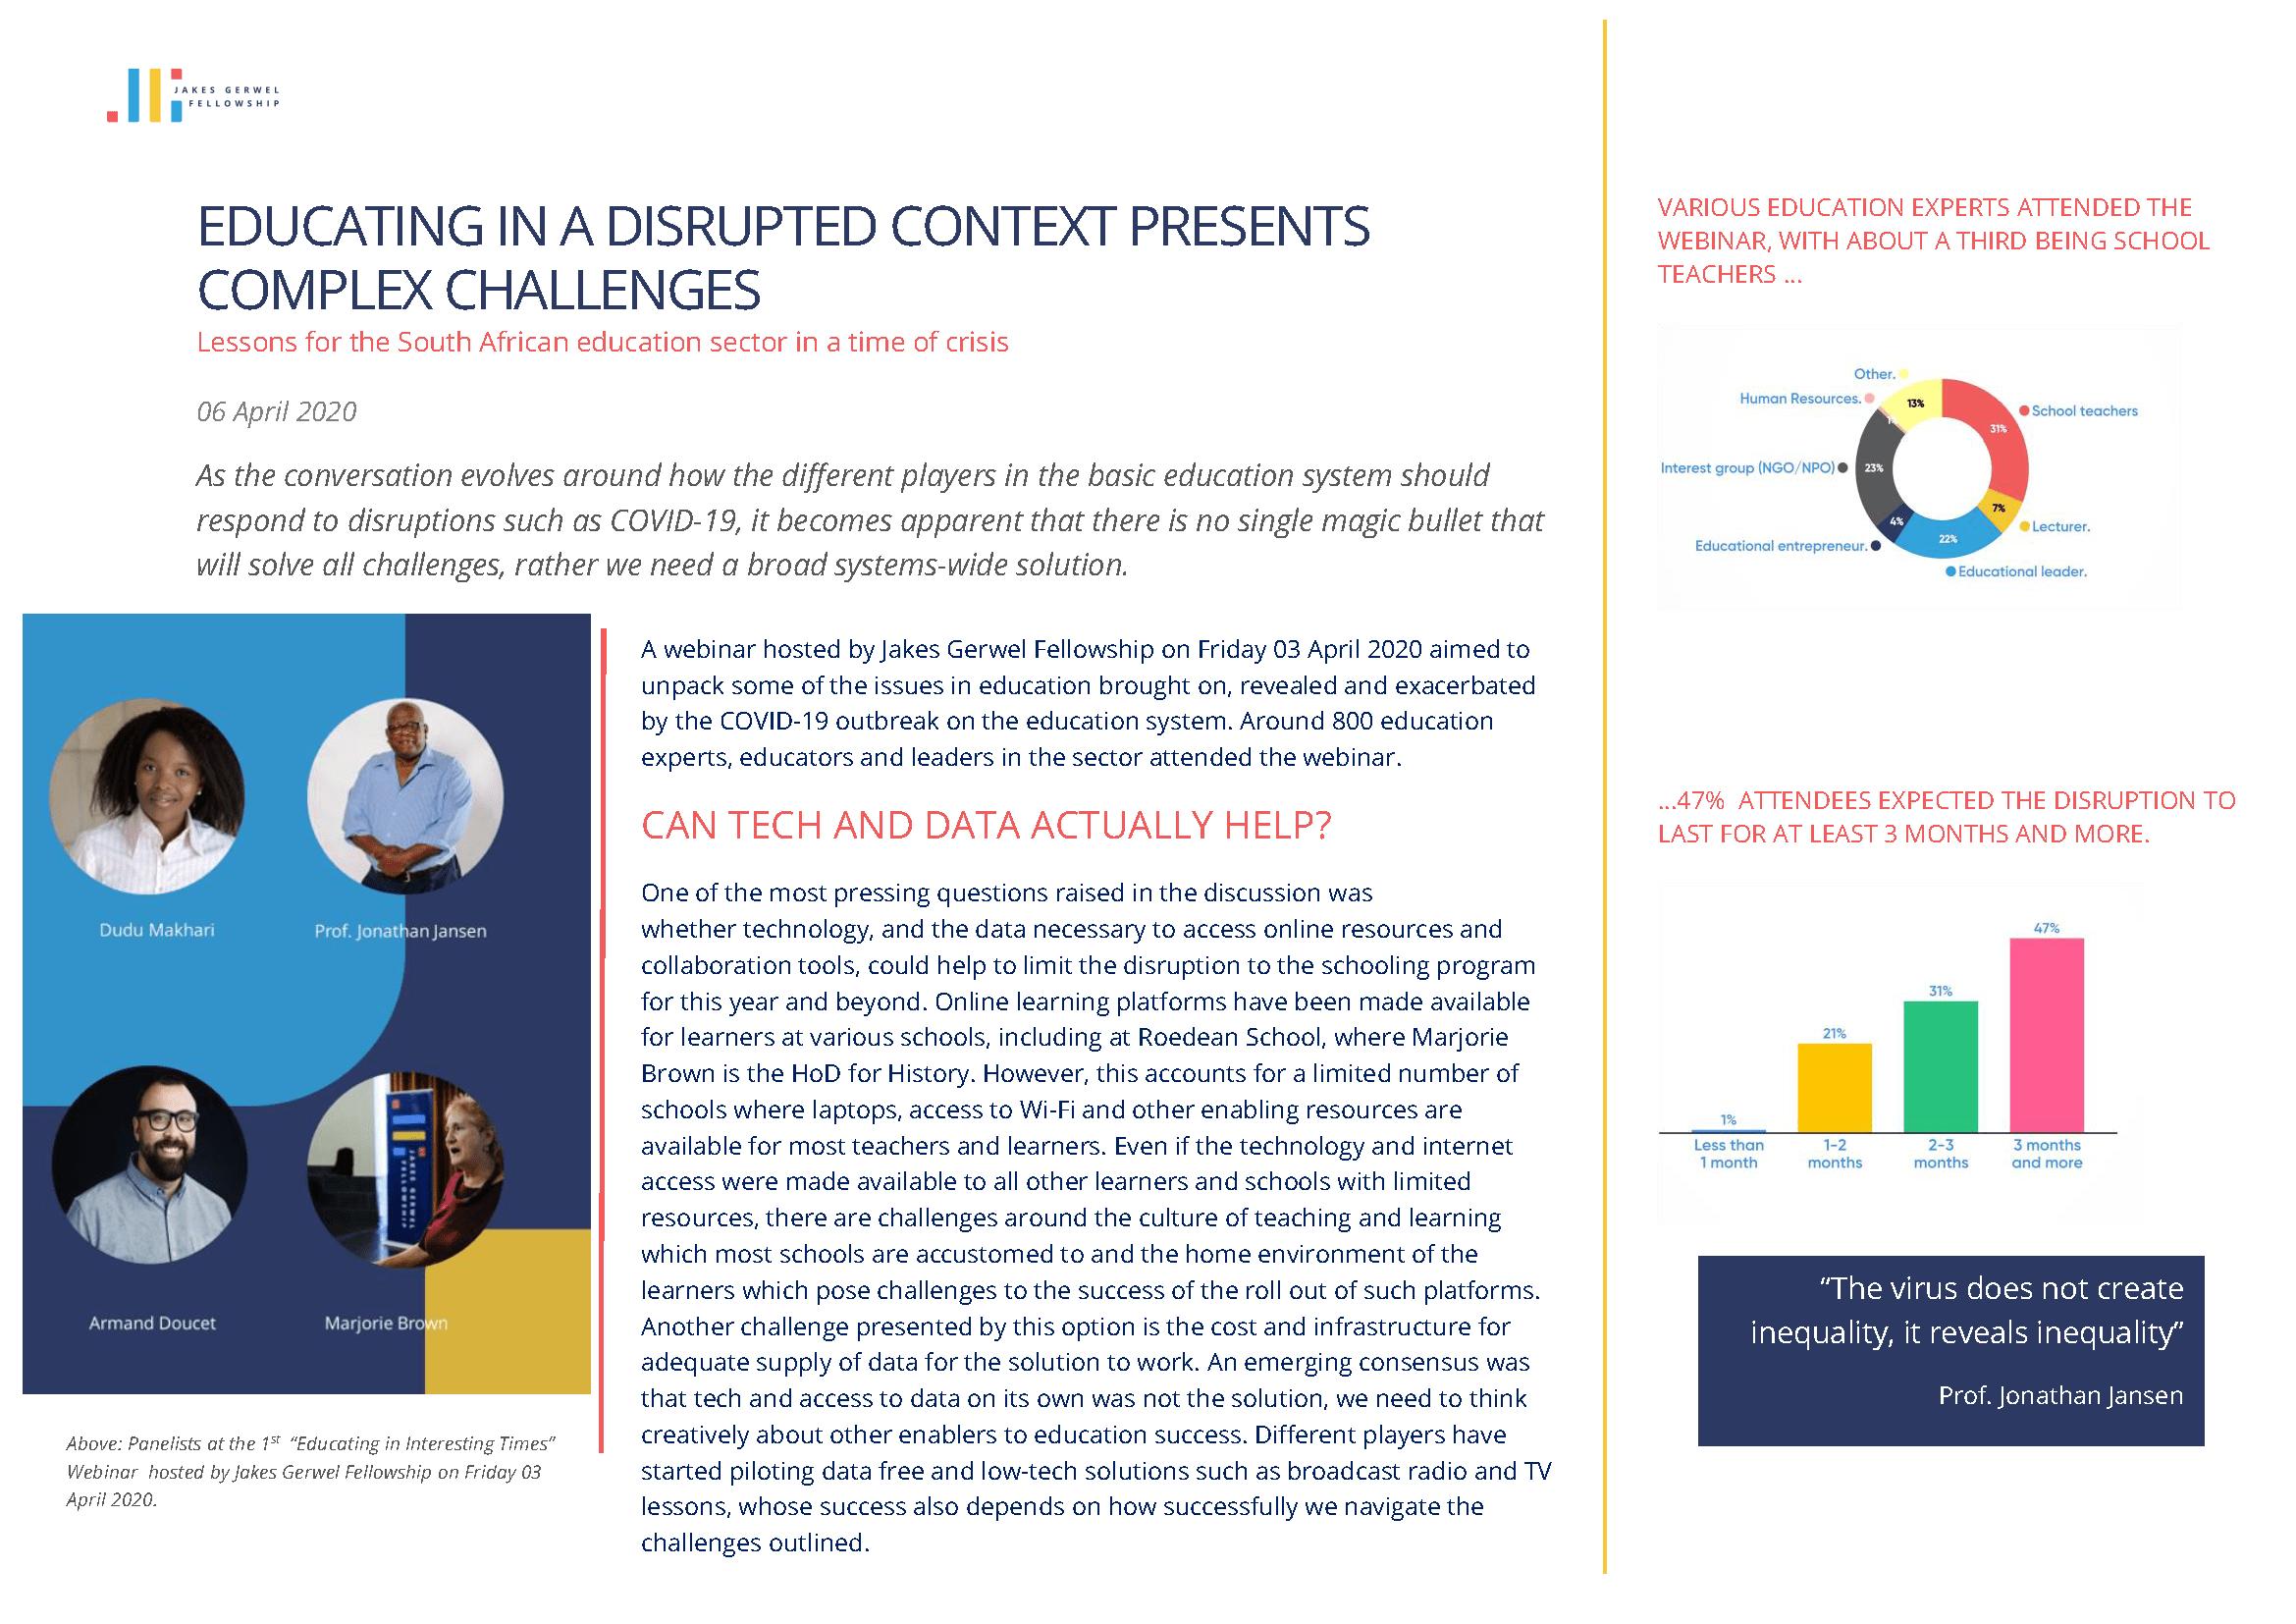 education-in-interesting-times-webinar-text-diagram